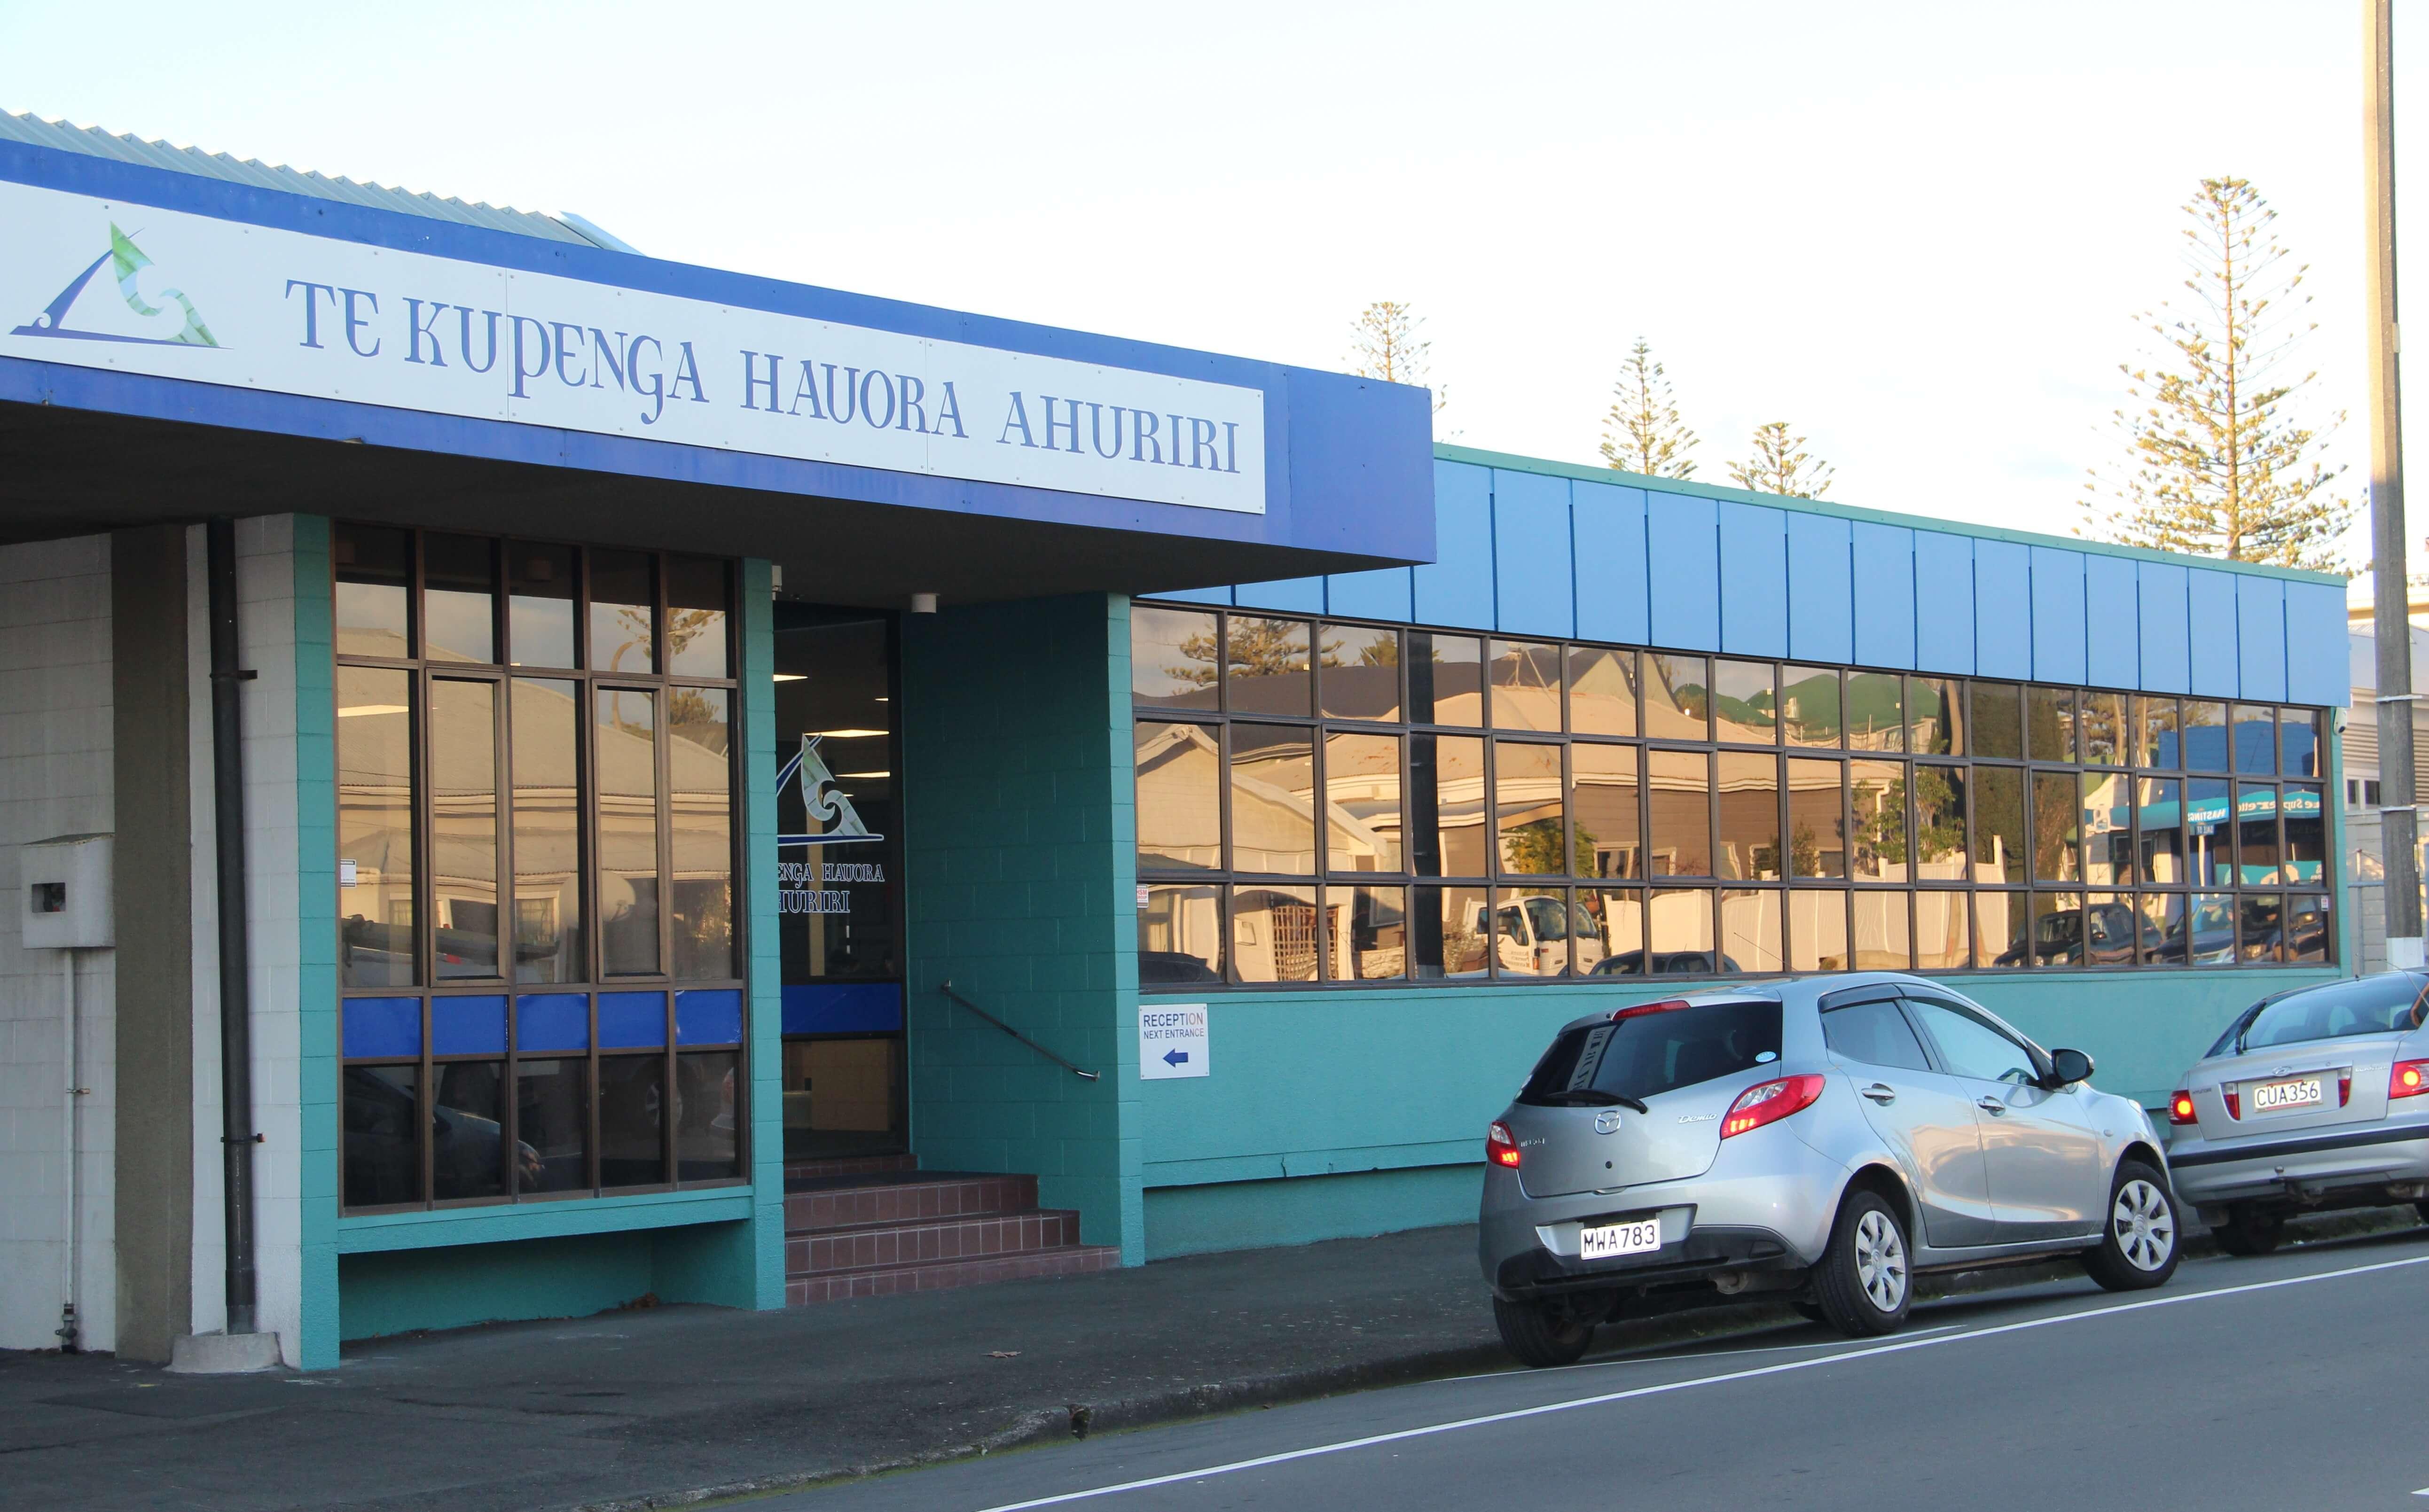 Te Kupenga Hauora - Ahuriri Building